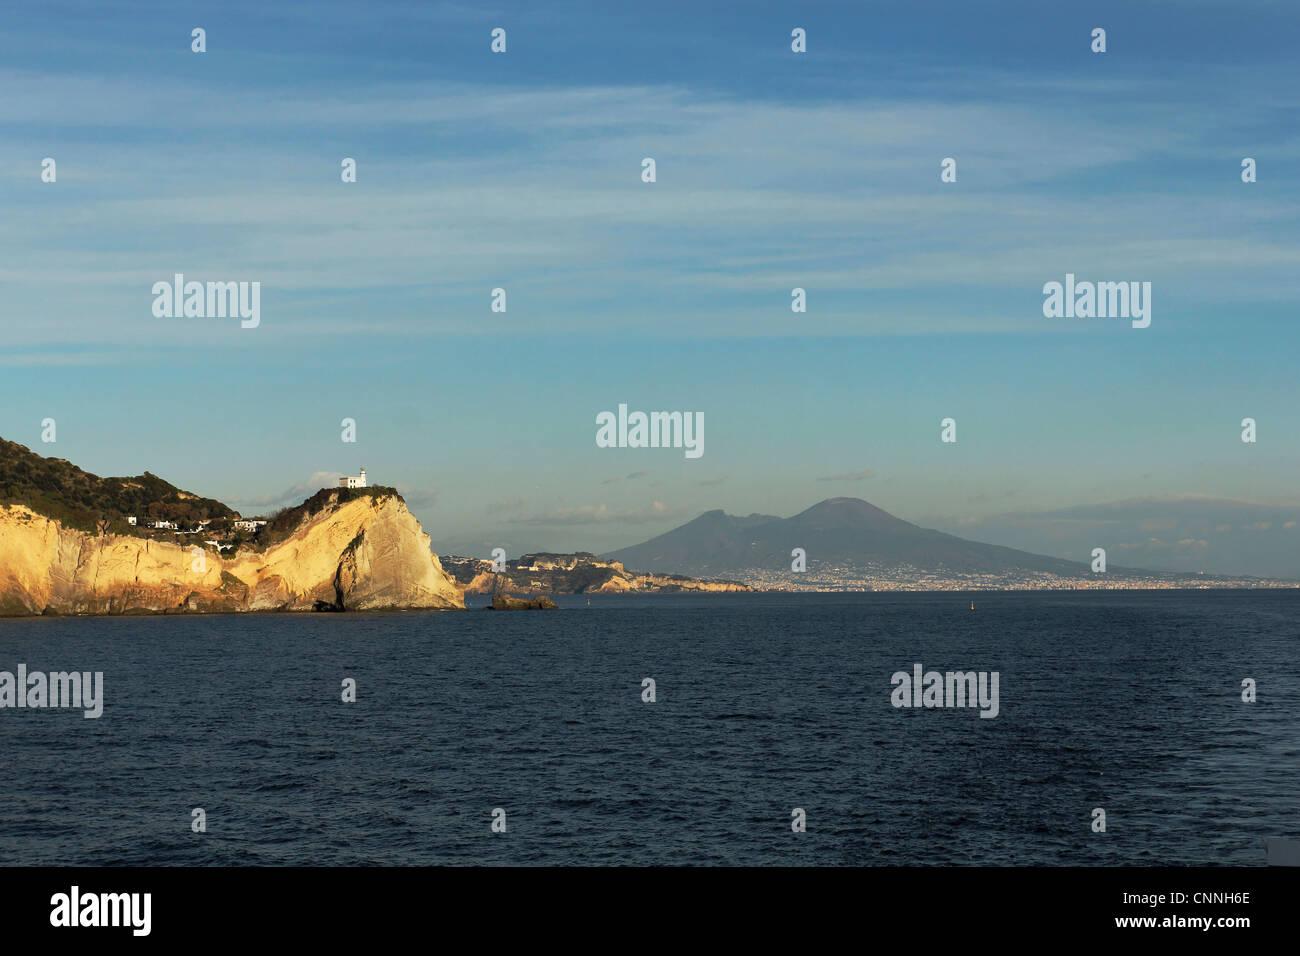 The lighthouse of Capo Miseno with Naples and the Volcano Vesuvio in the background, Gulf of Naples, Pozzuoli, Campania, - Stock Image